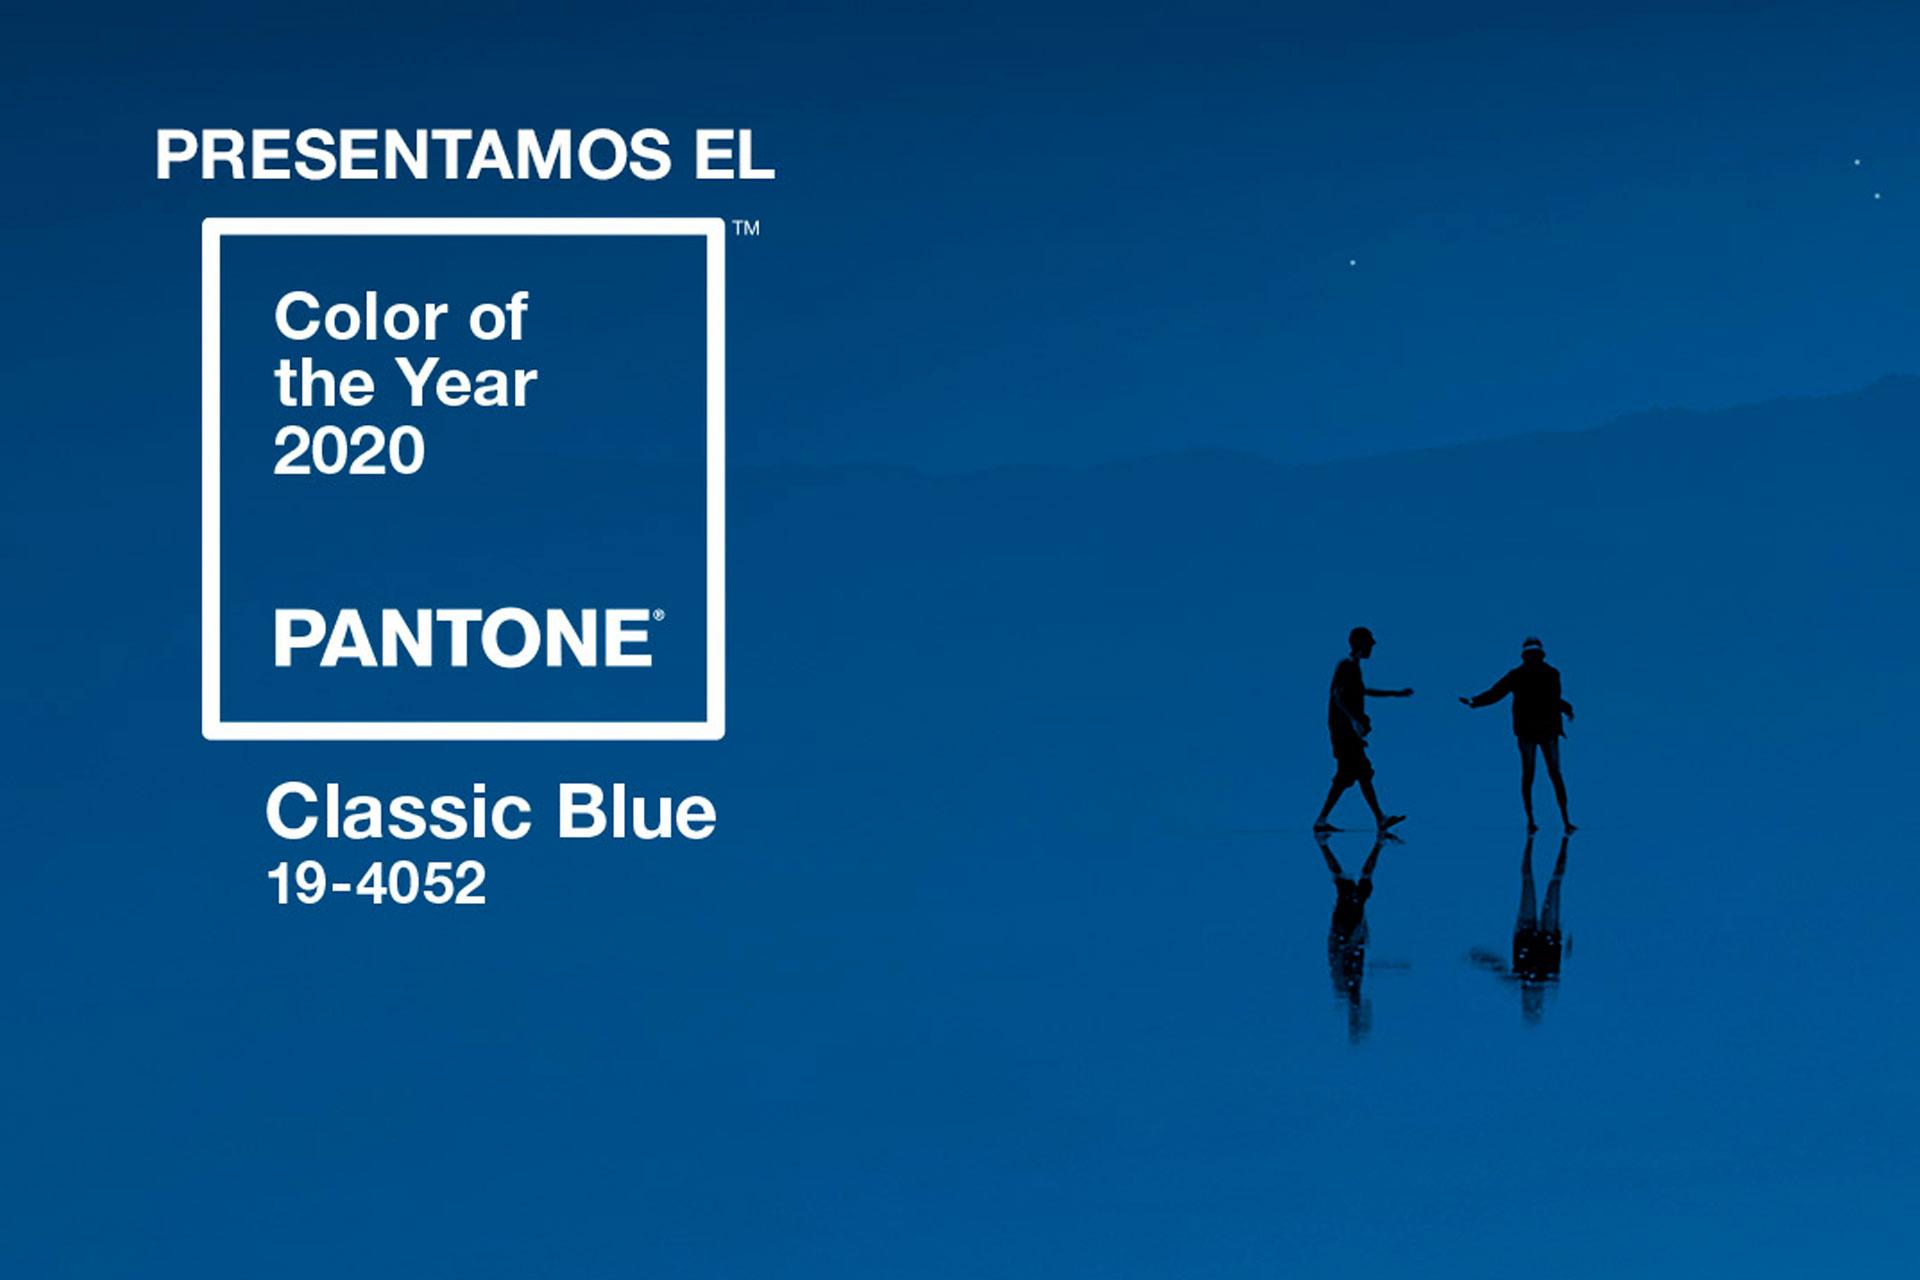 clasic blue 19-4052